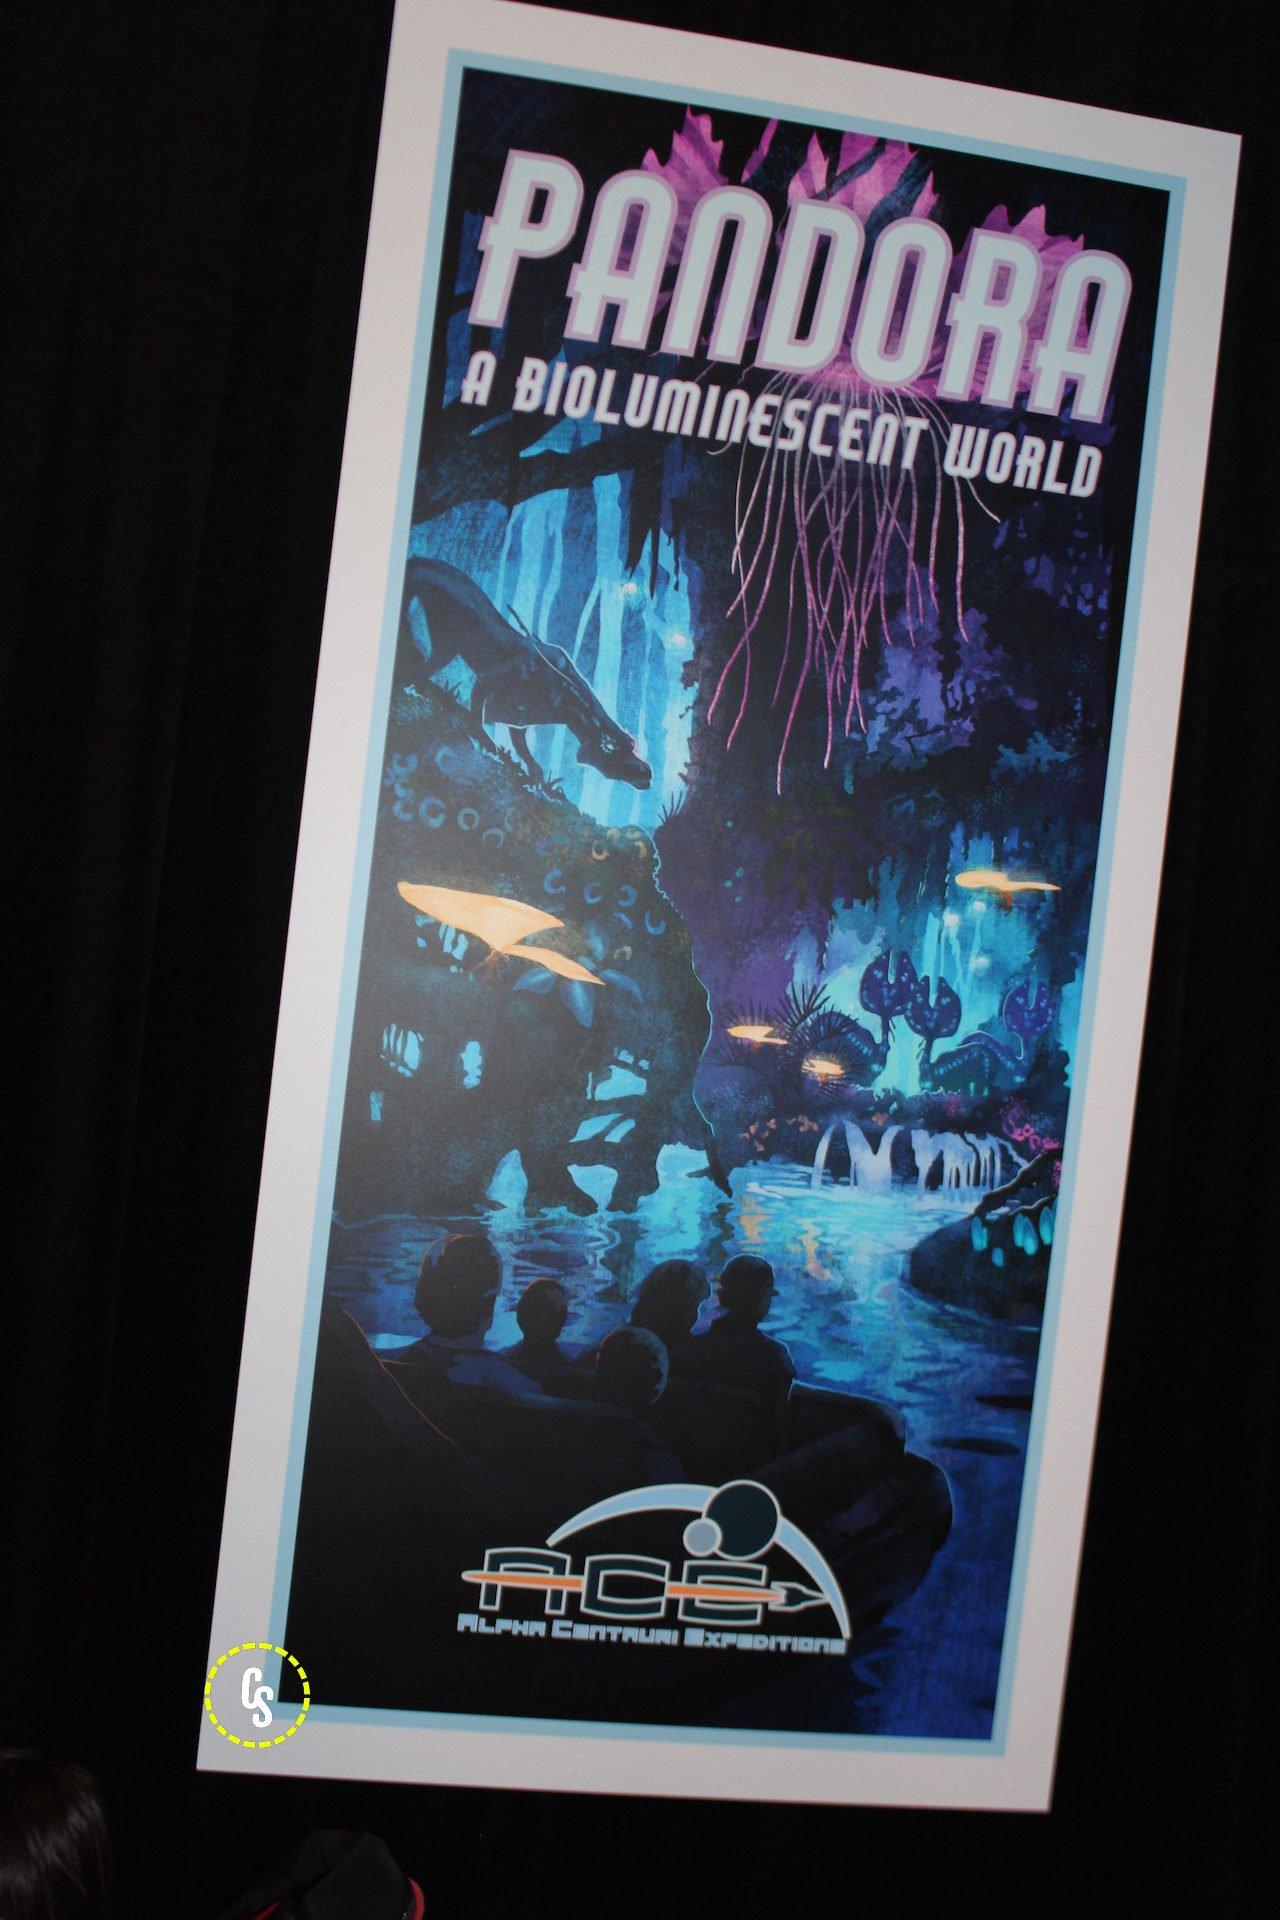 Pandora: Un mundo bioluminiscente